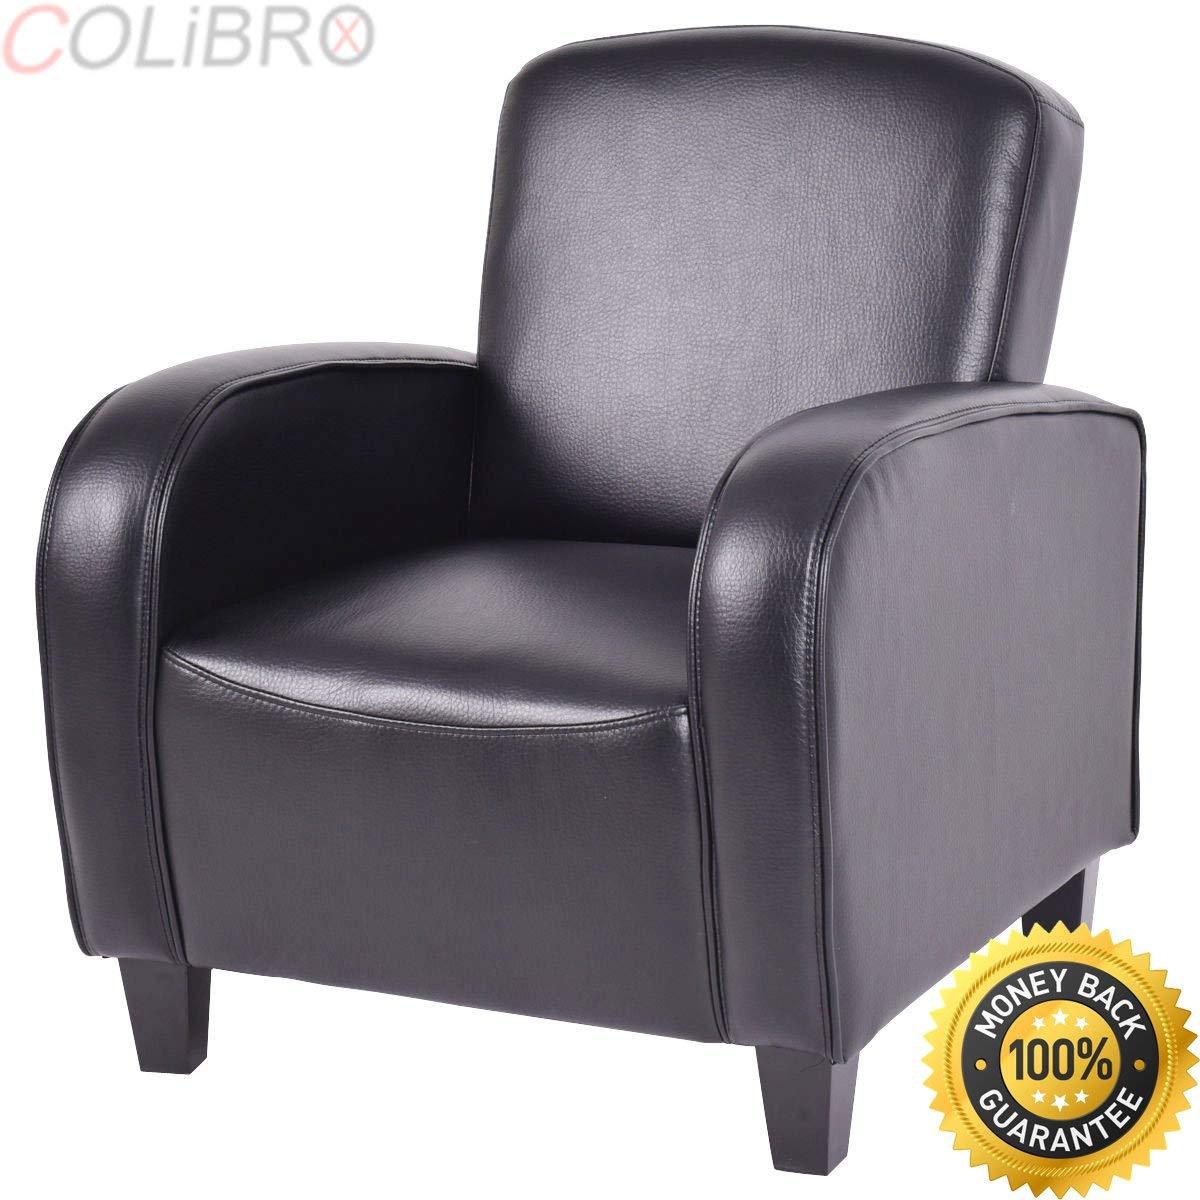 COLIBROX--Modern Accent Arm Chair Single Sofa Seat Leisure Living Room Furniture Black. modern lounge chairs. modern accent arm chairs clearance. lounge chairs for bedroom.modern leather accent chair.